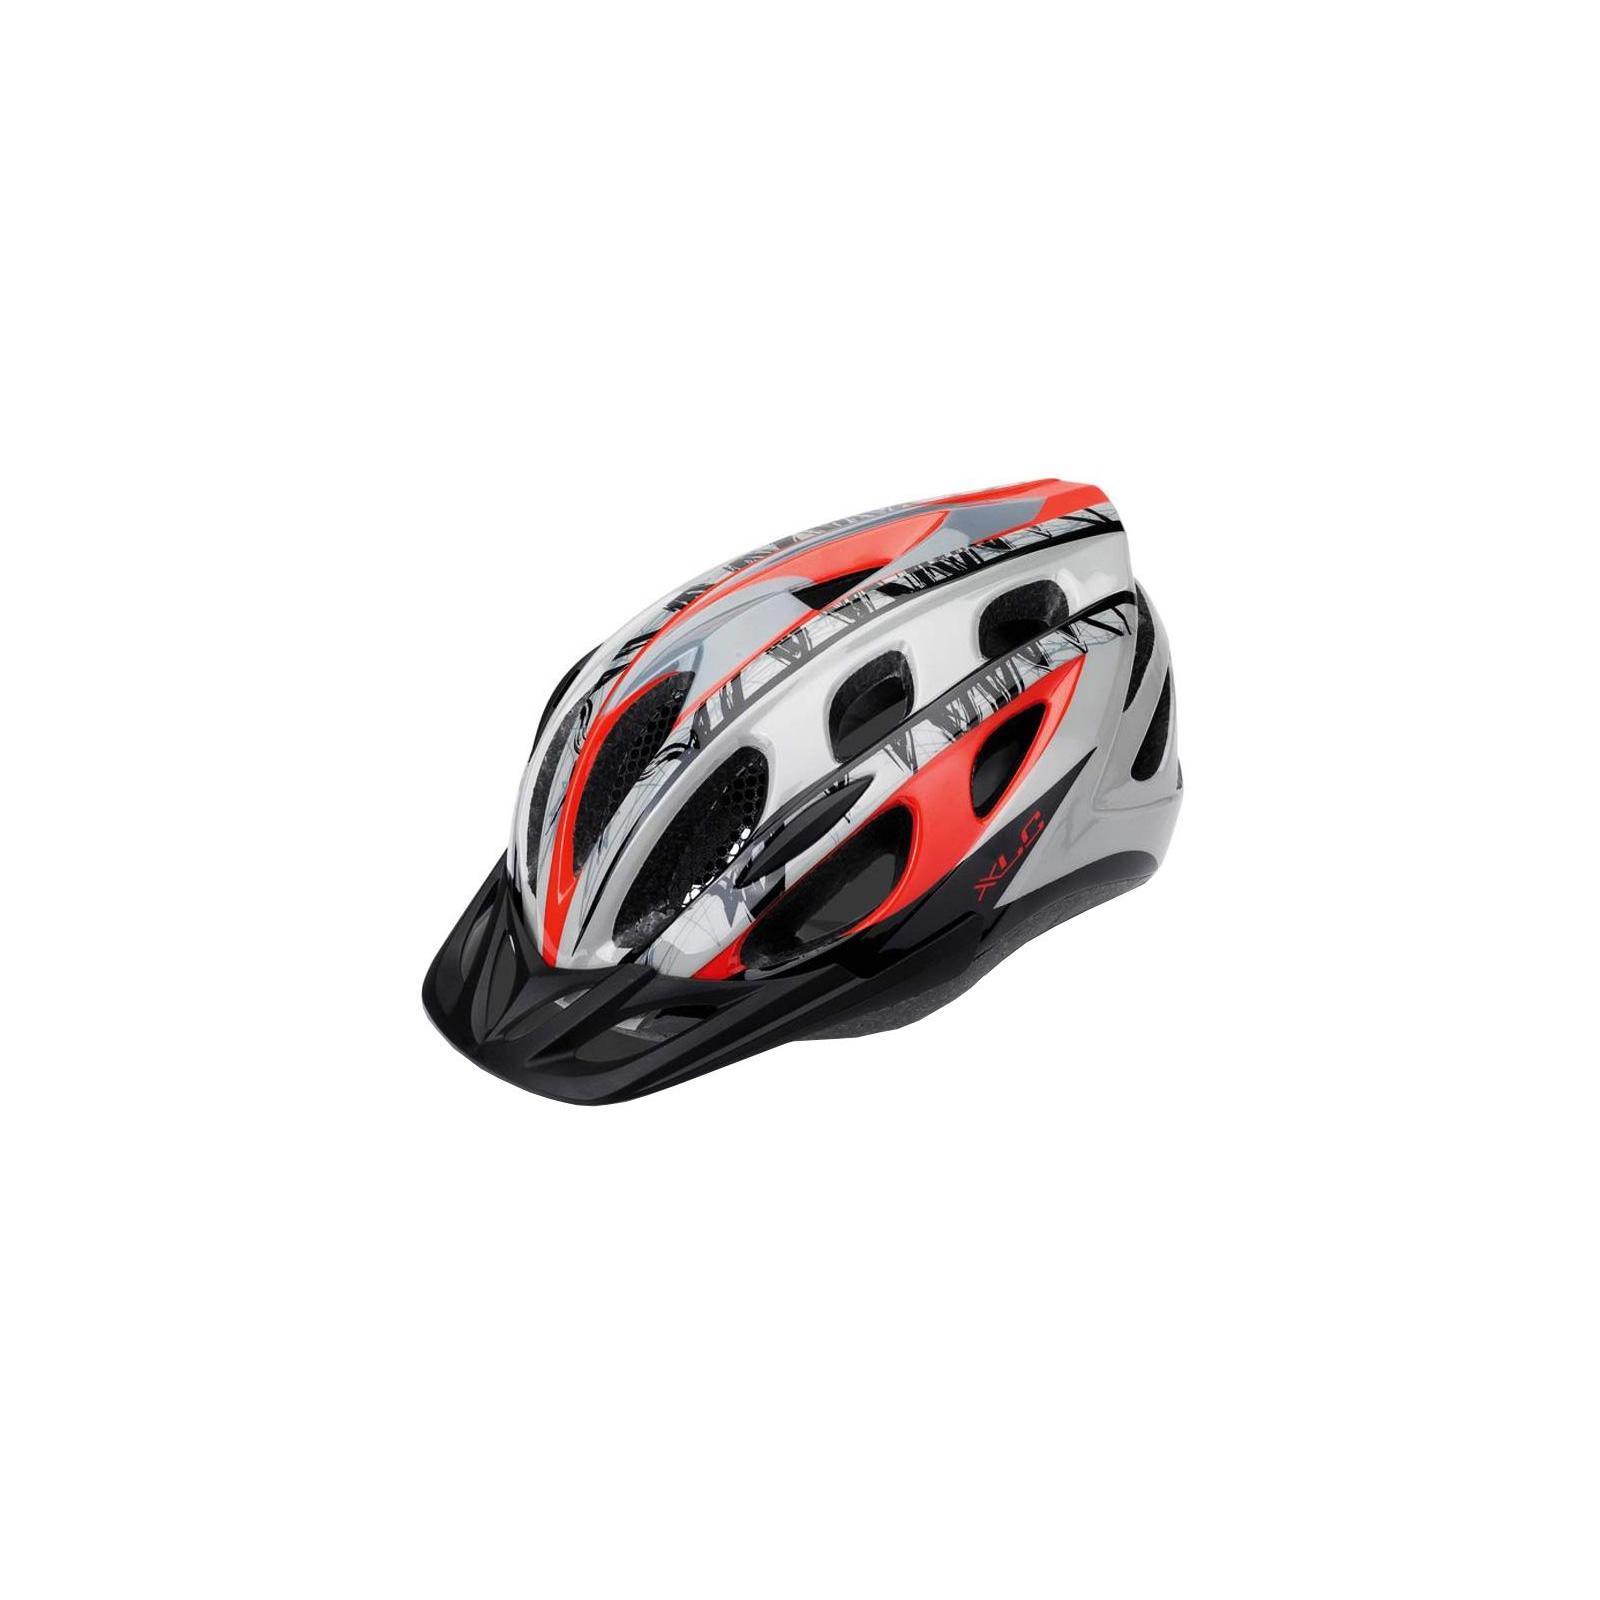 Шлем XLC BH-C18, красно-серый, L/XL (54-58) (2500180041)